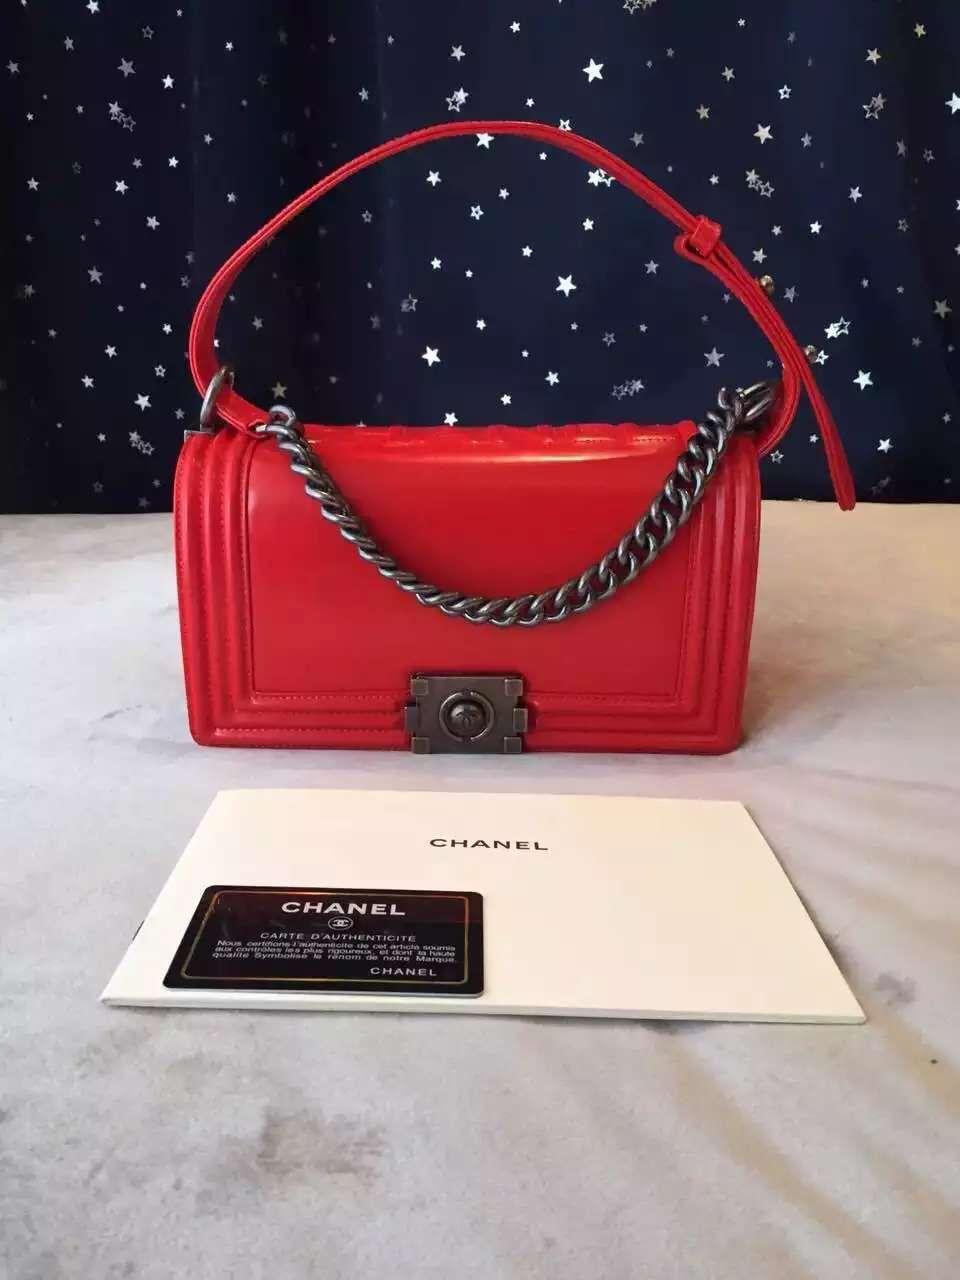 chanel Bag, ID : 31129(FORSALE:a@yybags.com), online shop chanel bags, chanel bags online, chanel buy designer handbags, chanel authentic designer handbags, chanel items, vintage chanel shop, chanel fabric handbags, chanel briefcases for sale, chanel purse wallet, chanel fashion purses, chanel cheap designer purses, chanel store online #chanelBag #chanel #chanel #com #shop